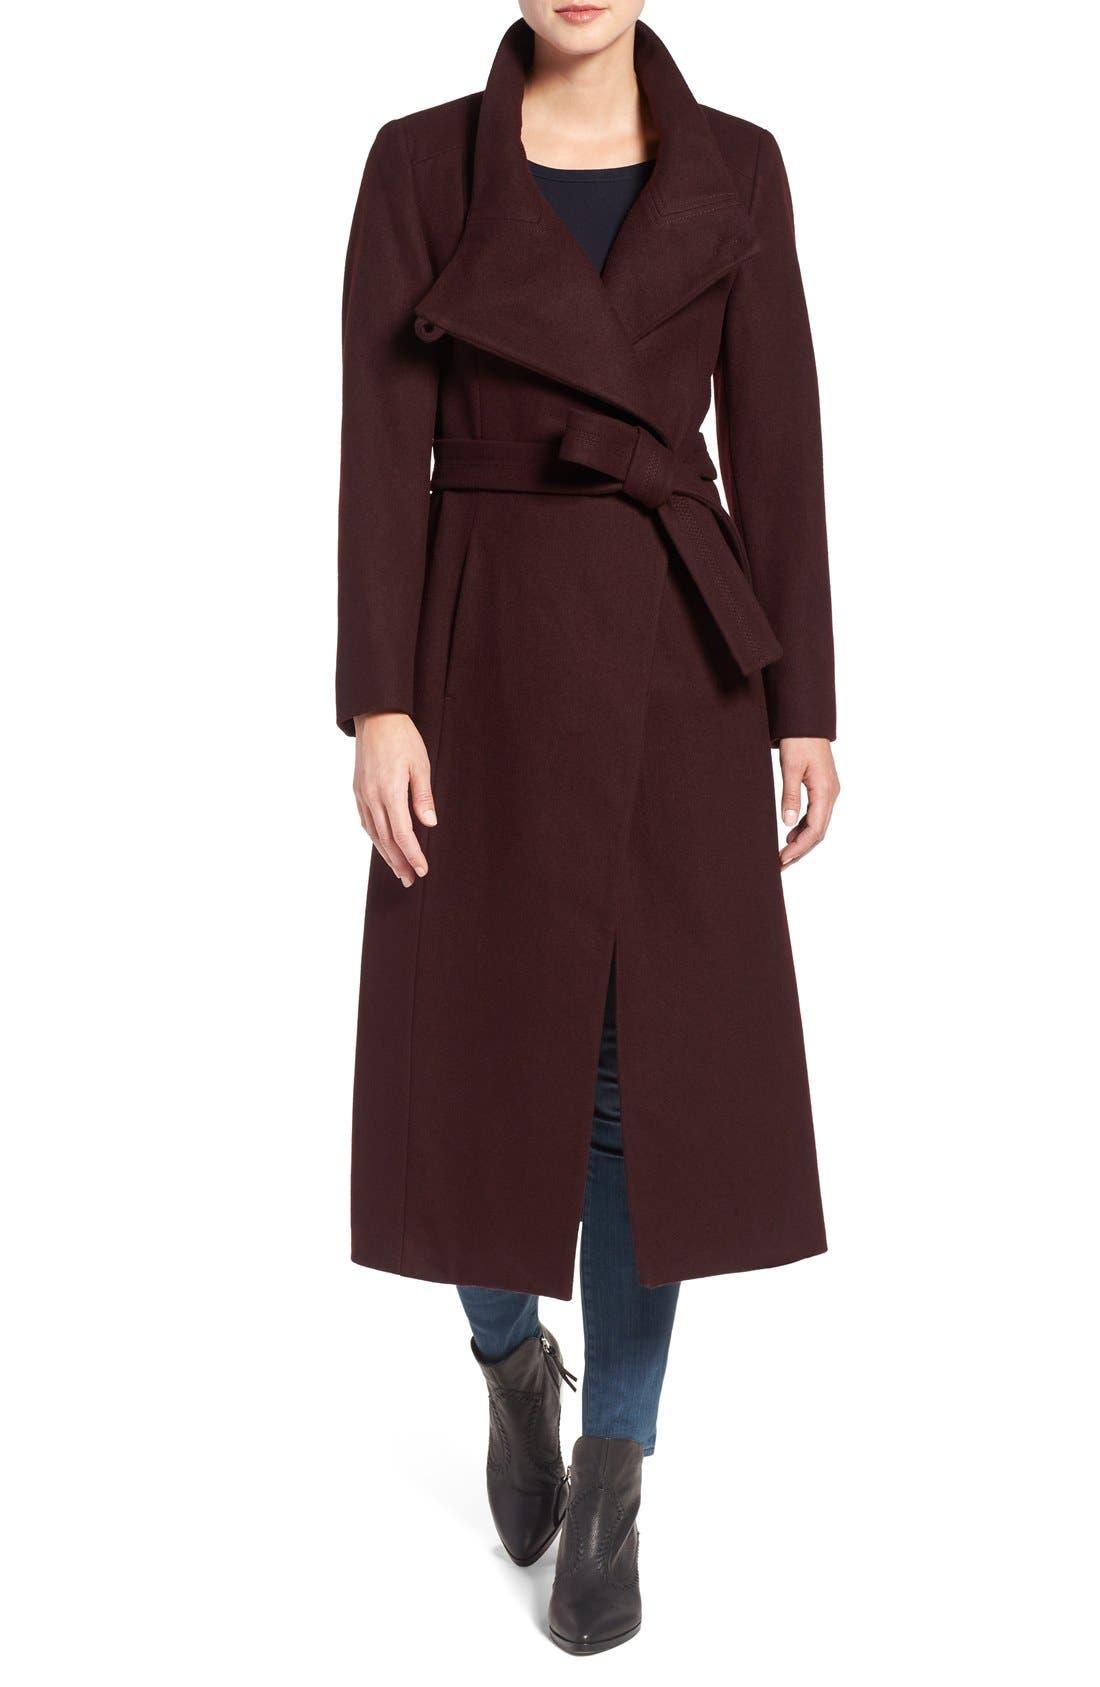 Warmest coat under 200